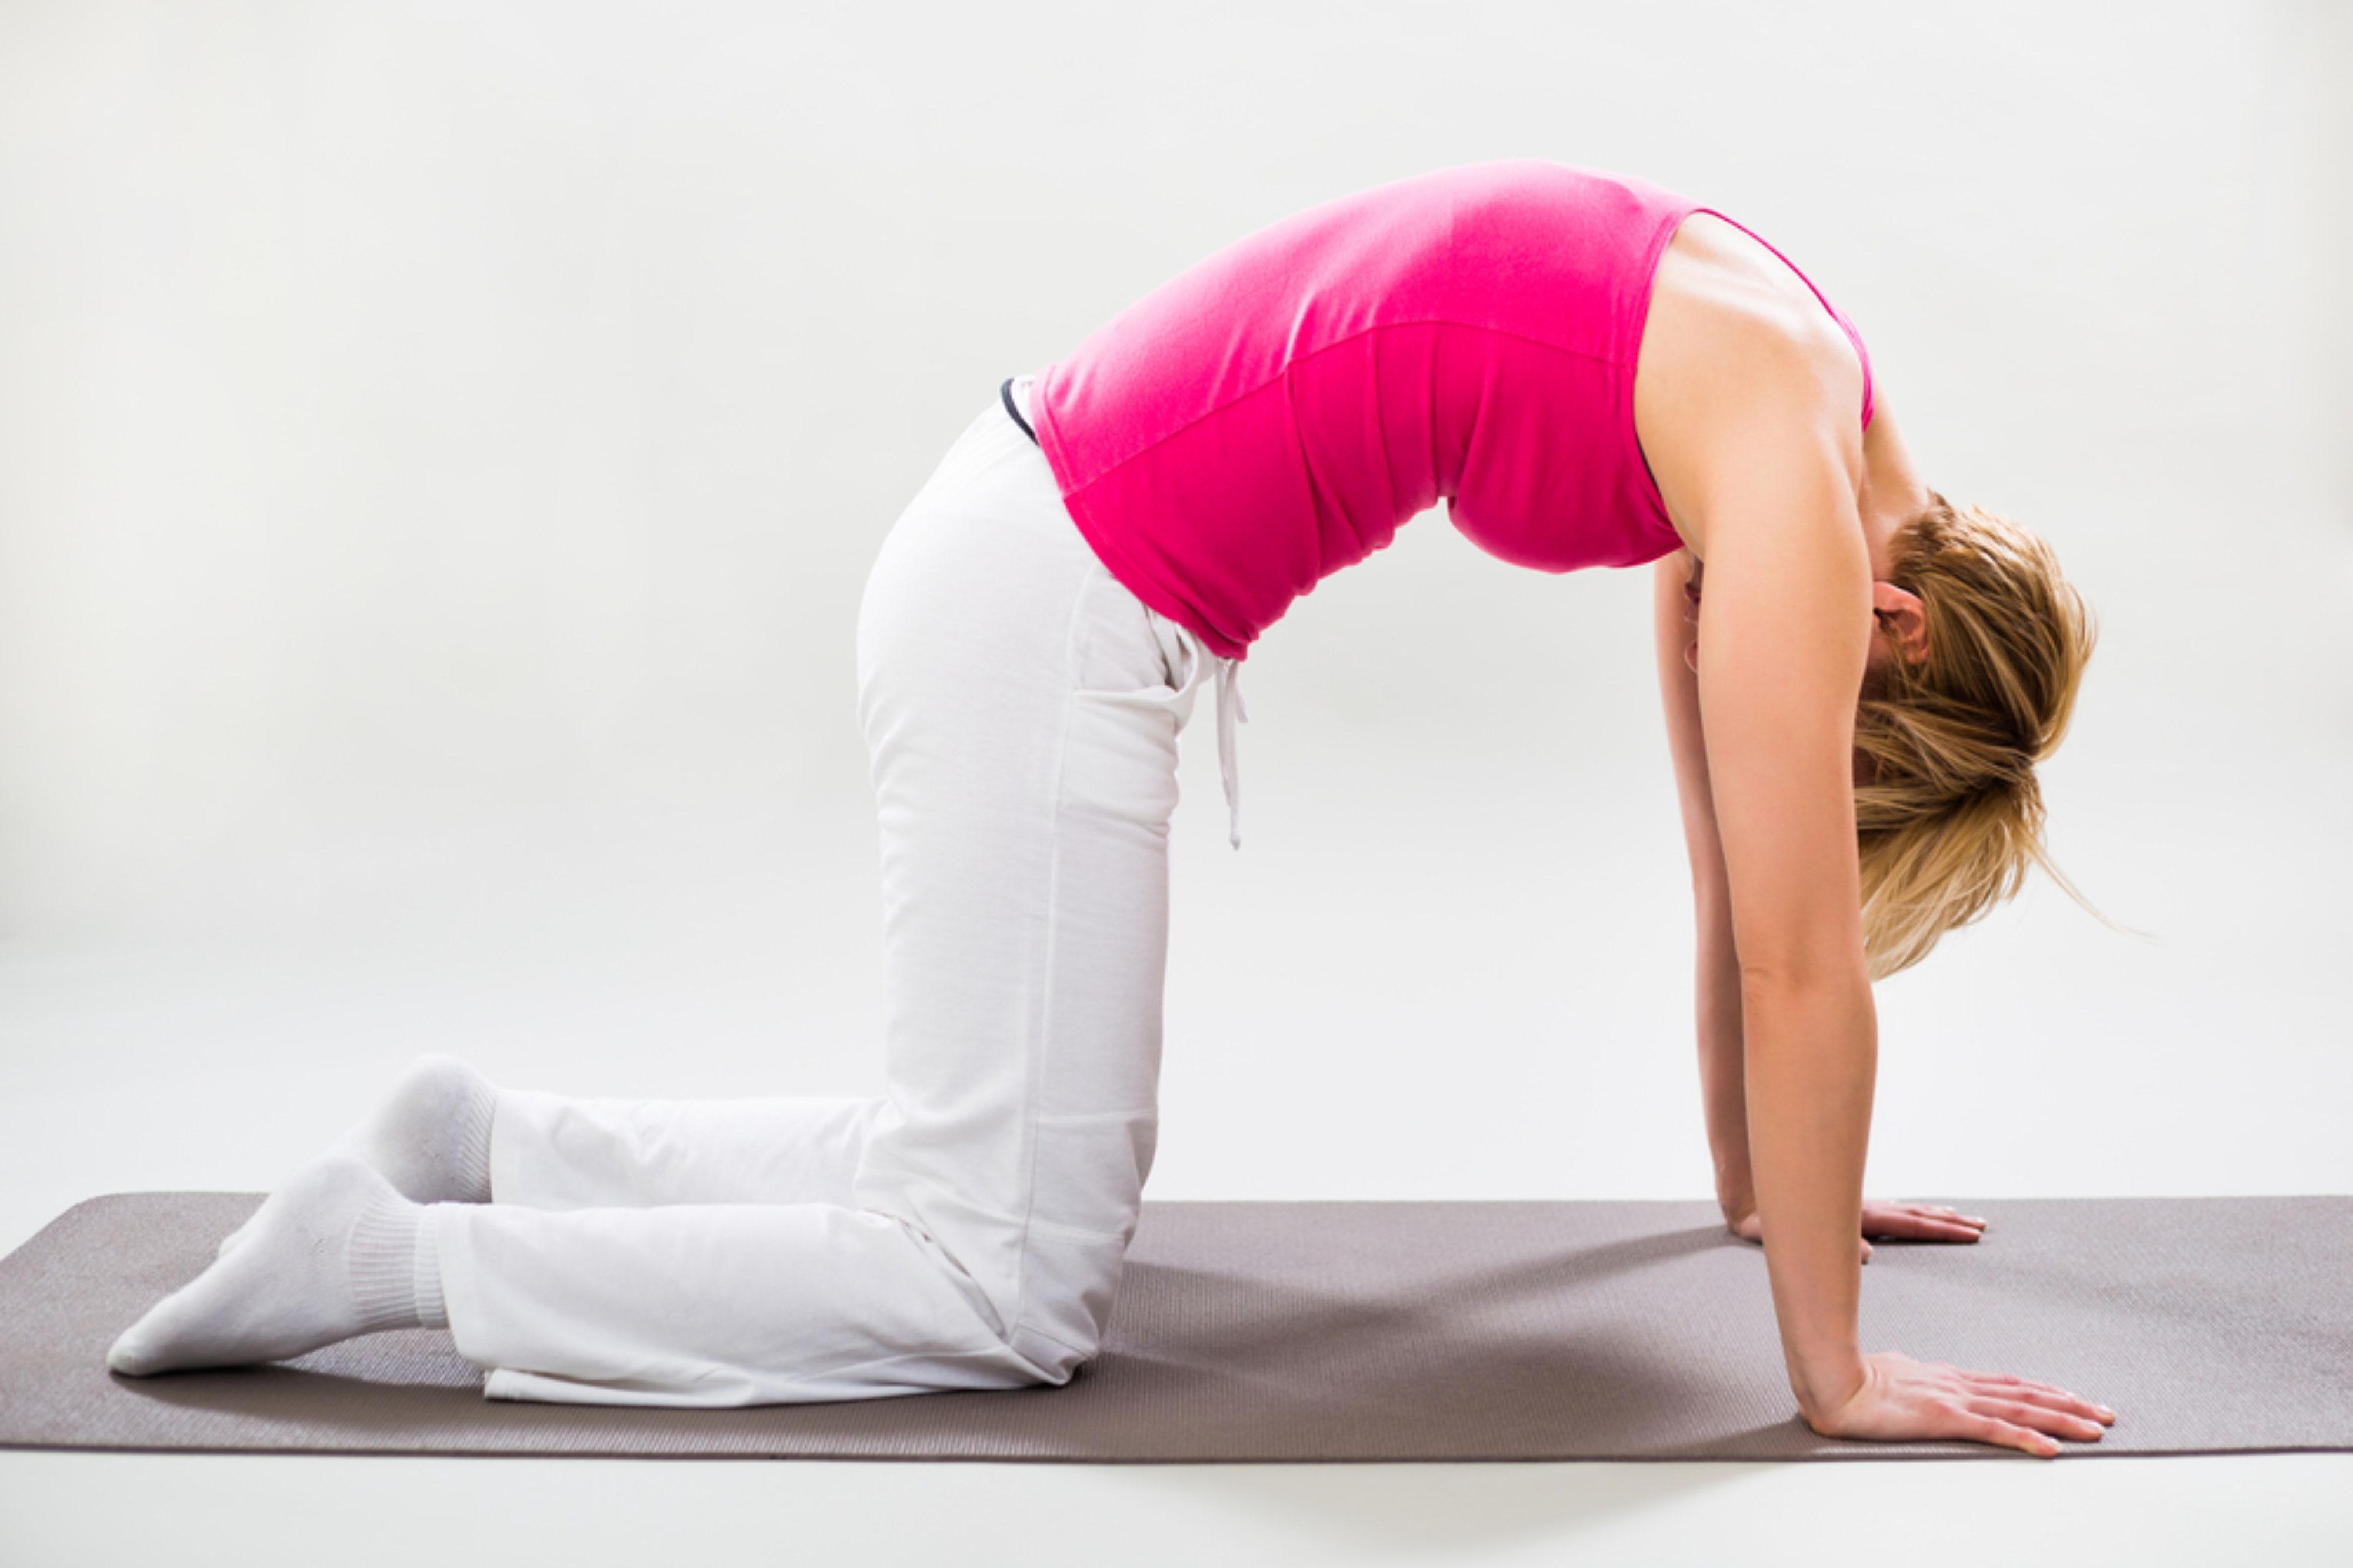 wirkung marjariasana yoga akademie n rnberg yogalehrer ausbildung n rnberg. Black Bedroom Furniture Sets. Home Design Ideas